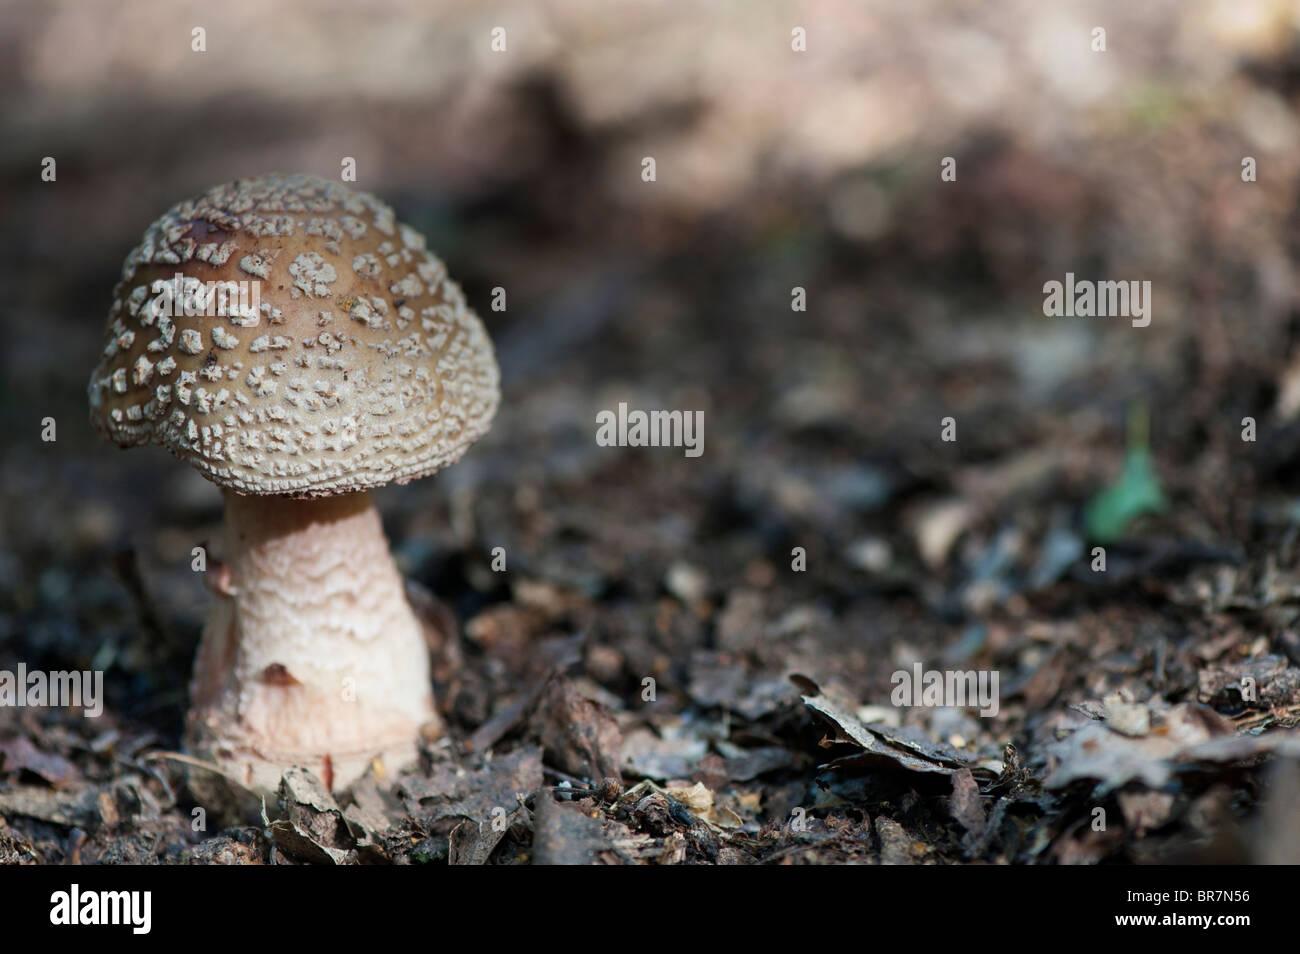 Amanita pantherina, Panther cap mushroom - Stock Image